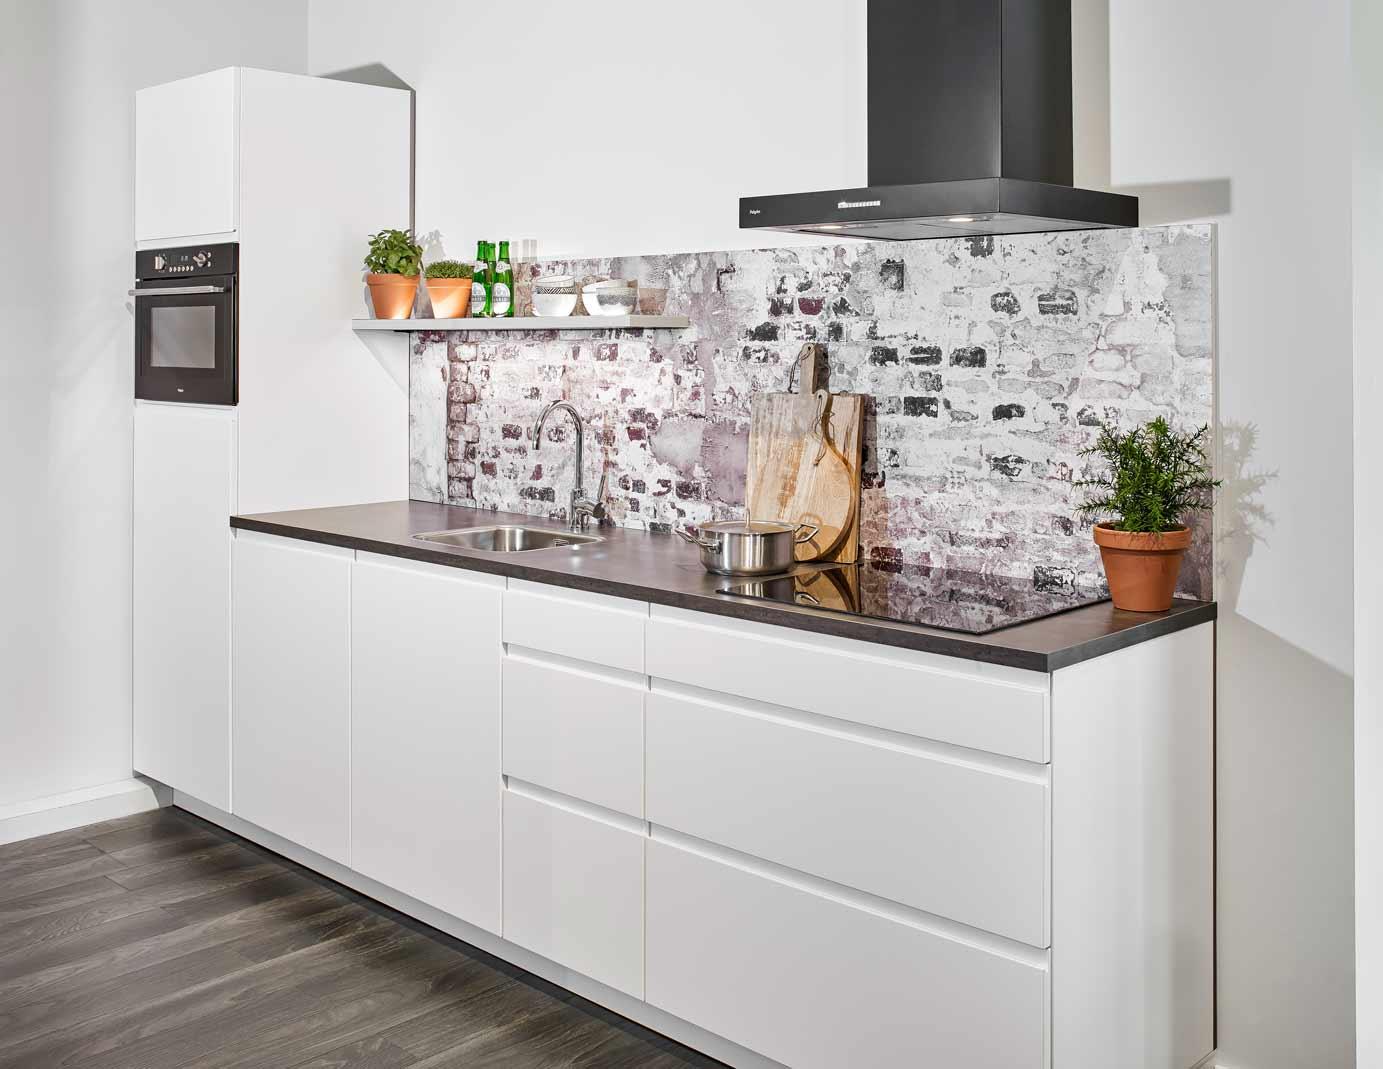 Greeploze Witte Keuken : Kunststof keuken semi greeploos wit modern greeploze witte